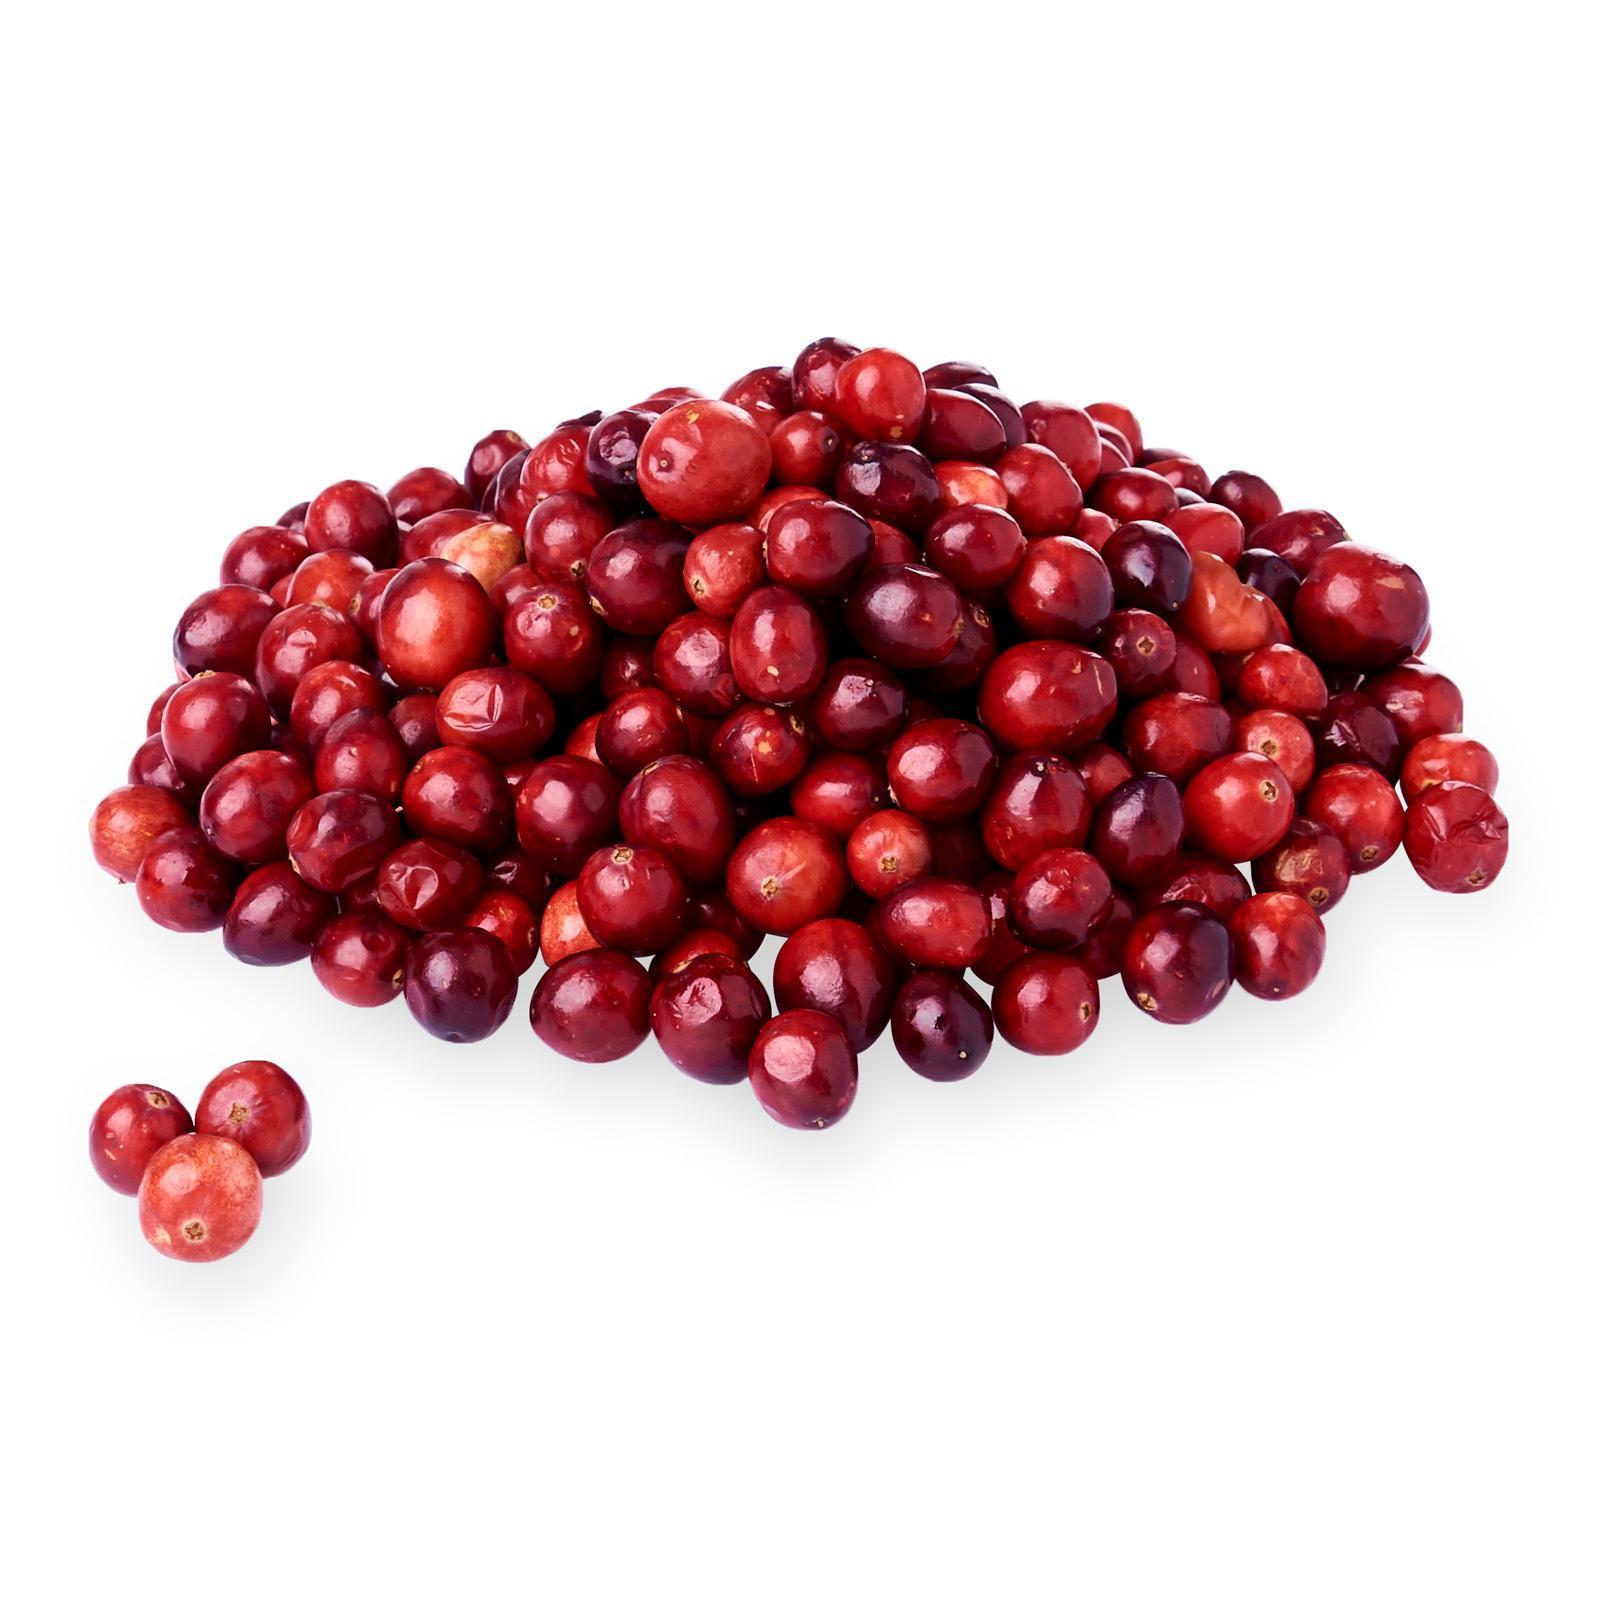 Naturipe/Ocean Spray Cranberries